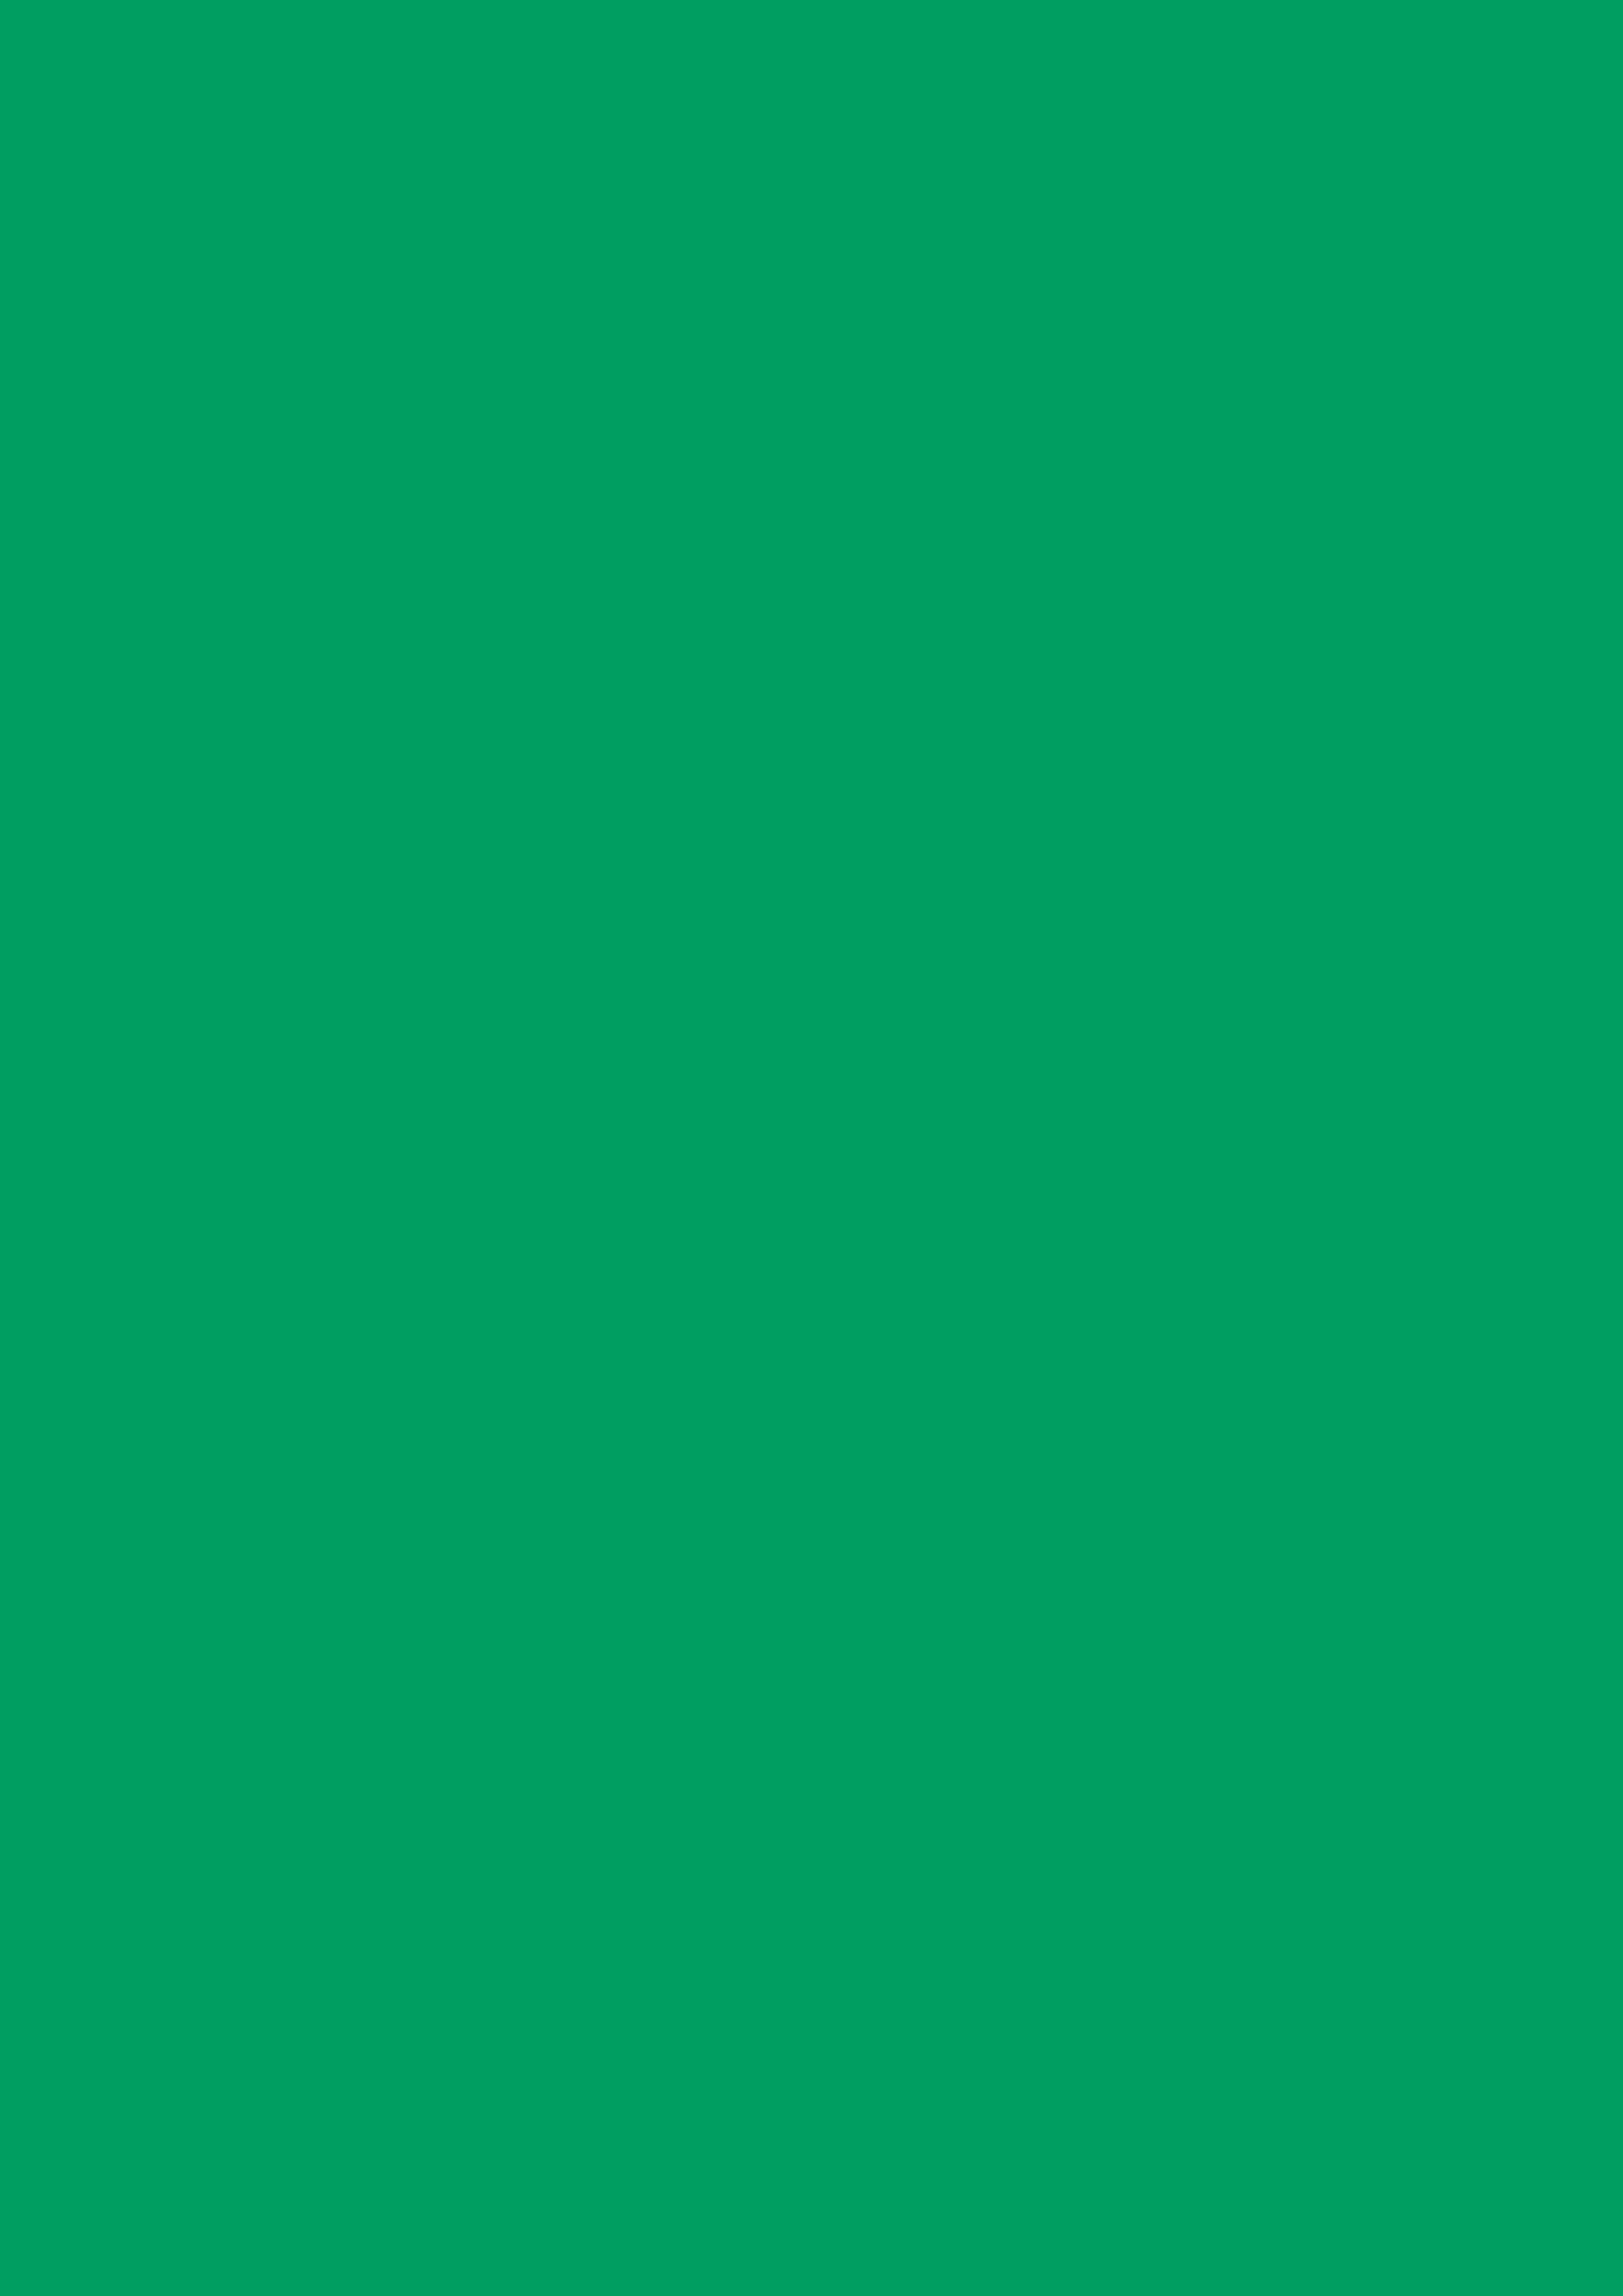 2480x3508 Shamrock Green Solid Color Background